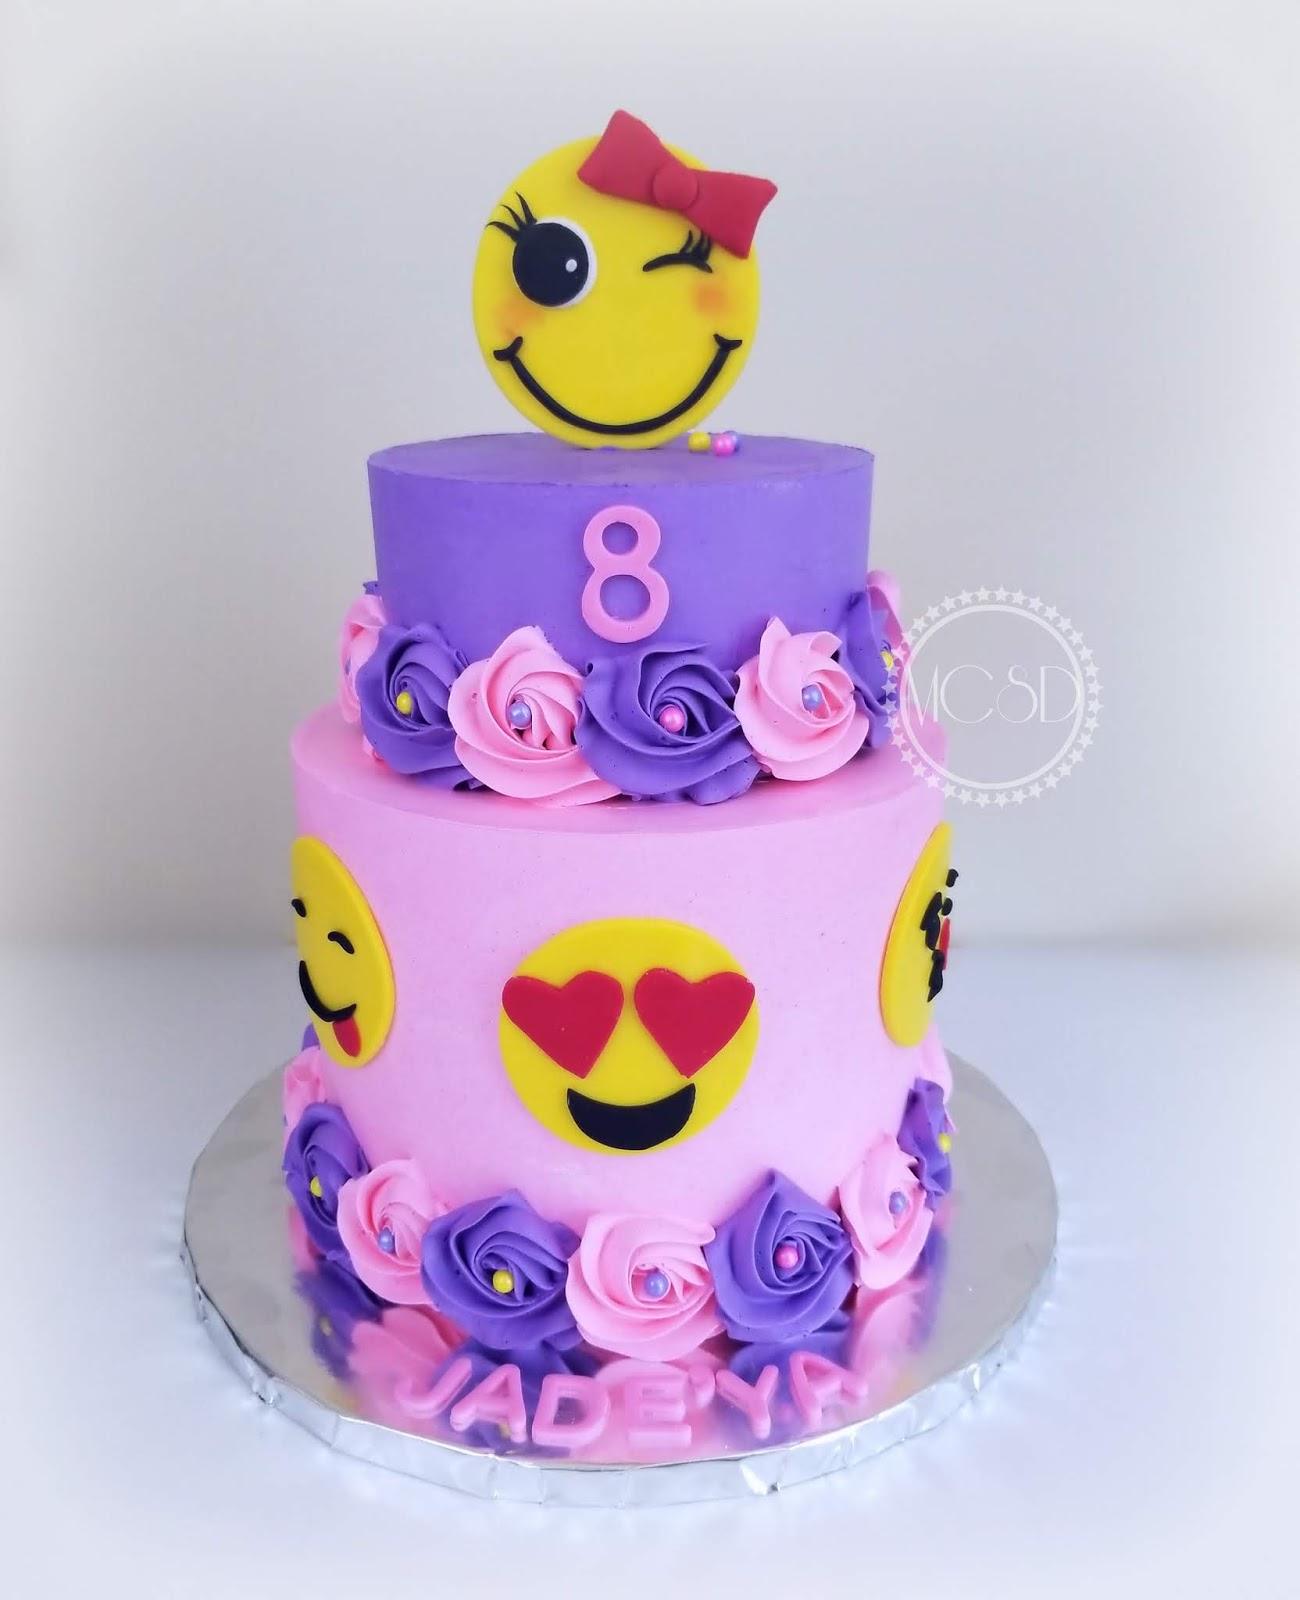 Mycakesweetdreams Emoji Birthday Cake